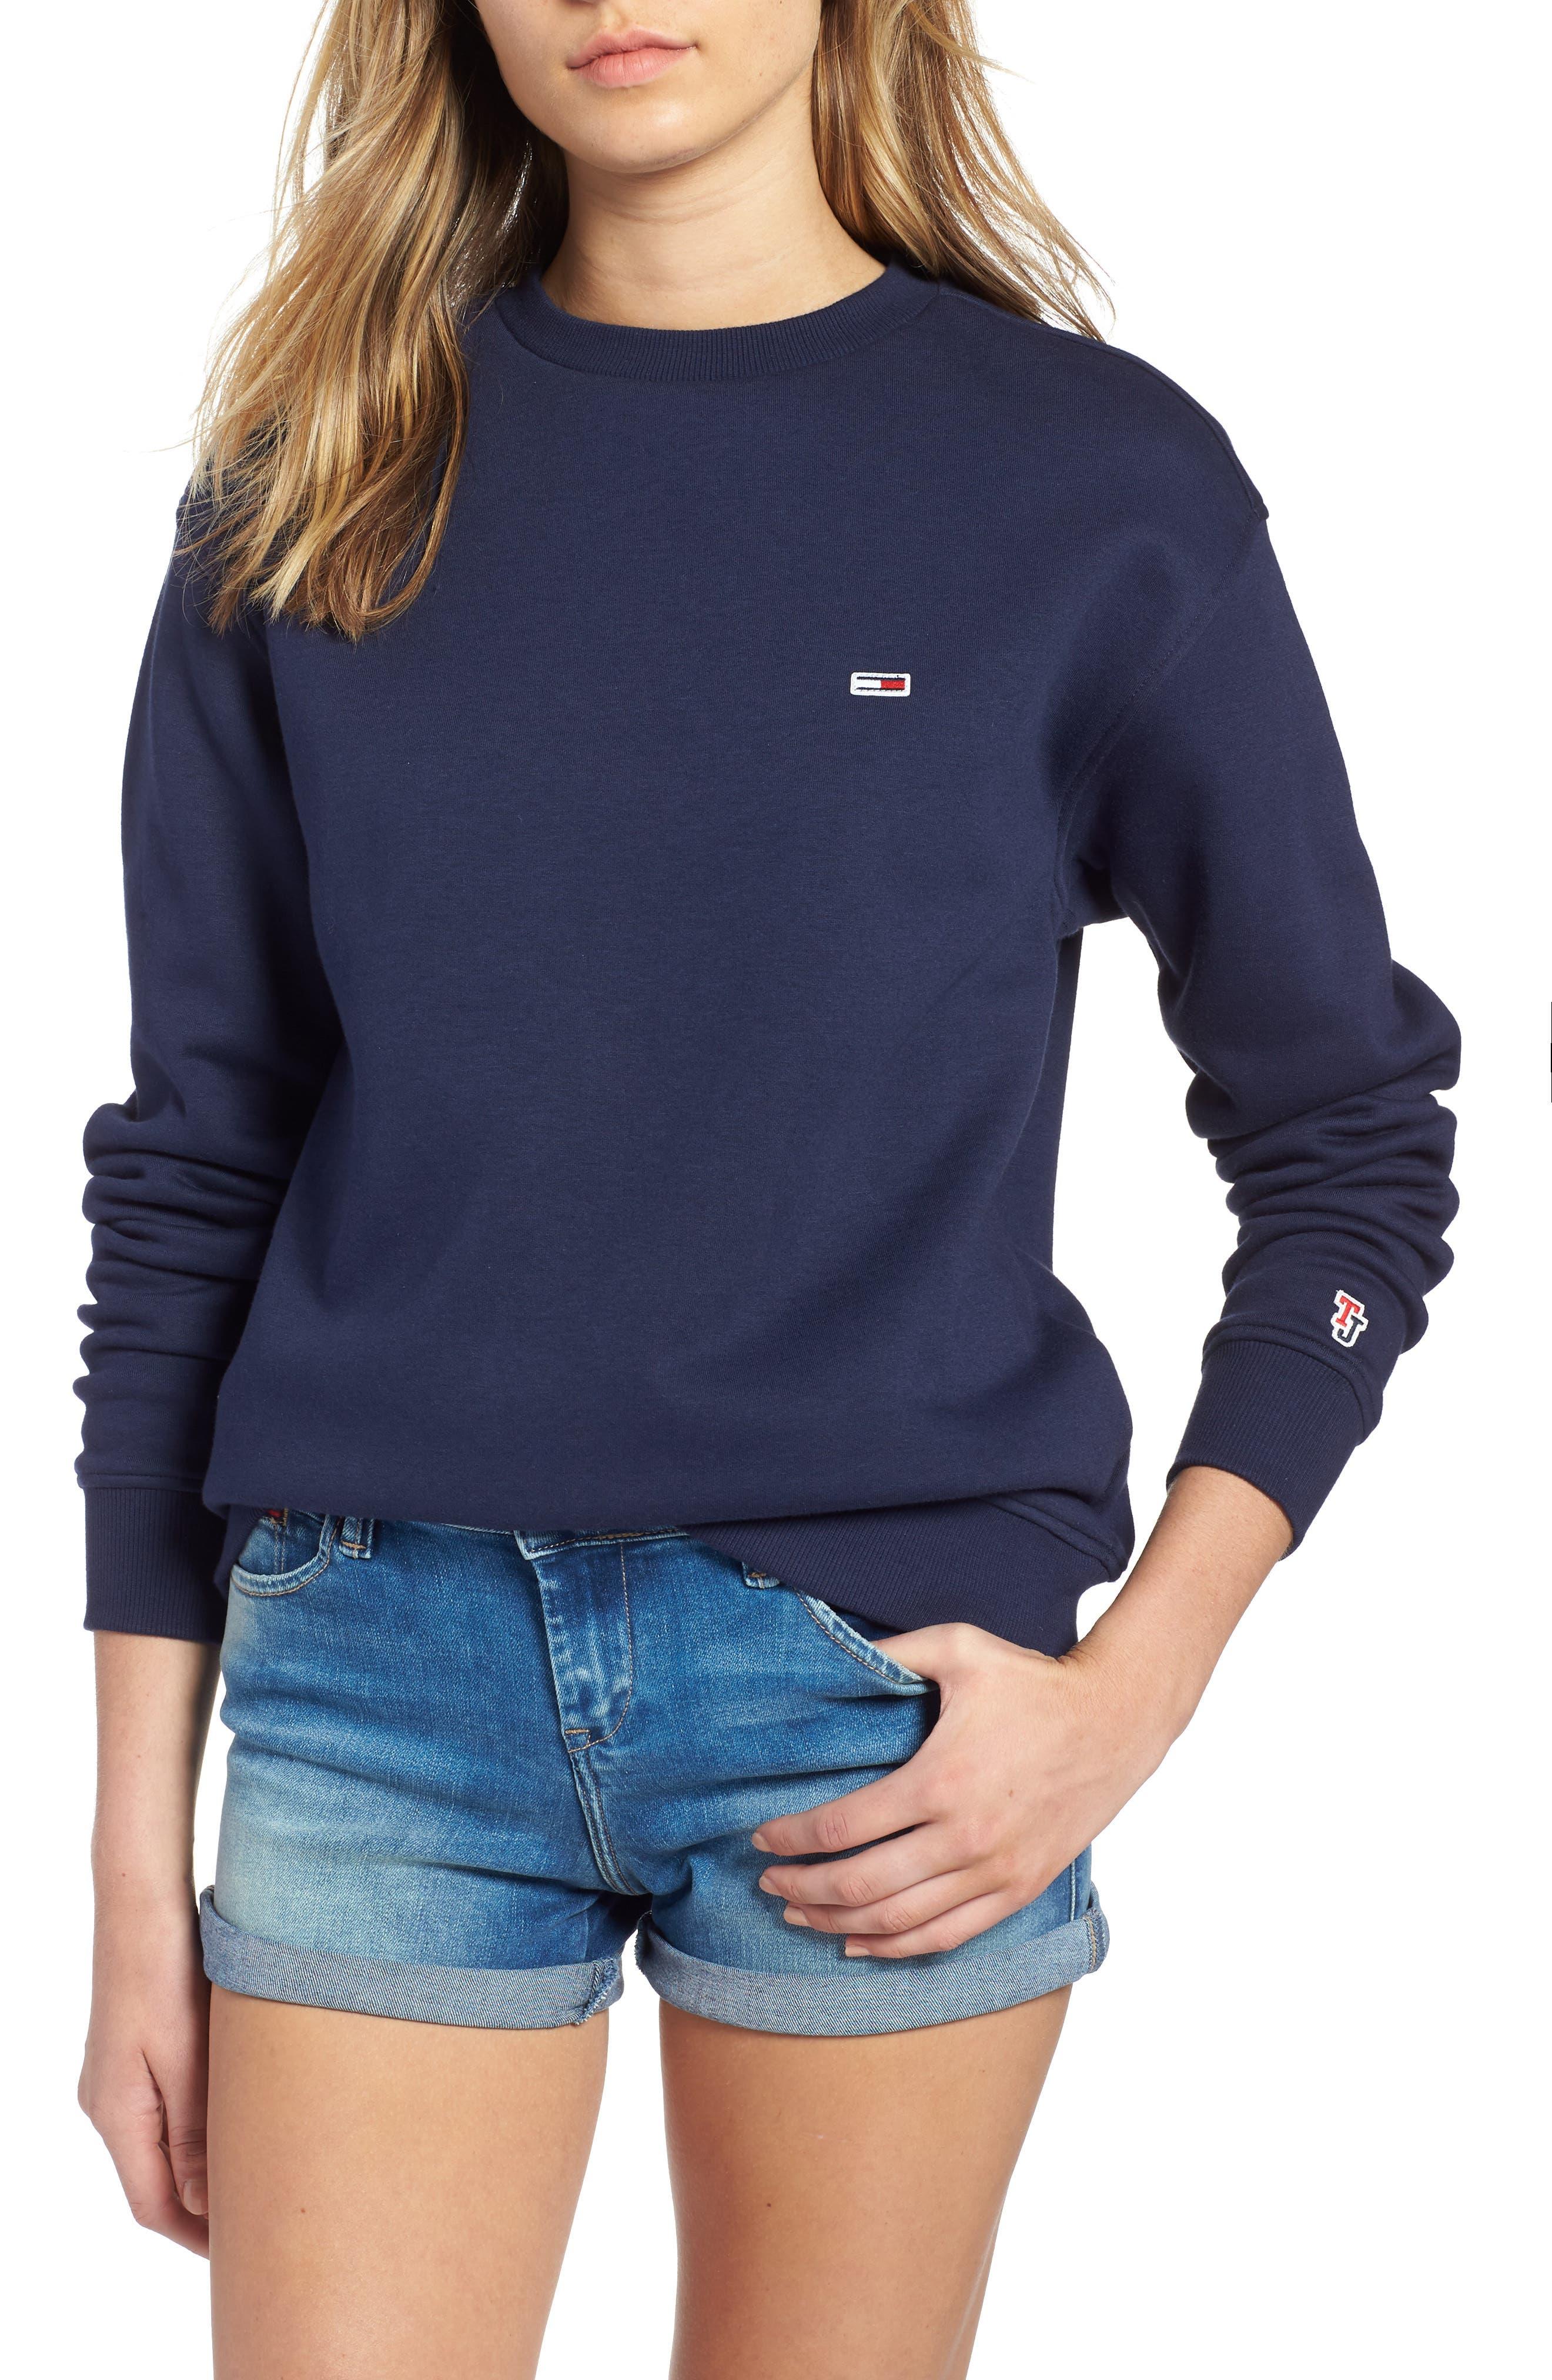 TJW Tommy Classics Sweatshirt,                         Main,                         color, 002